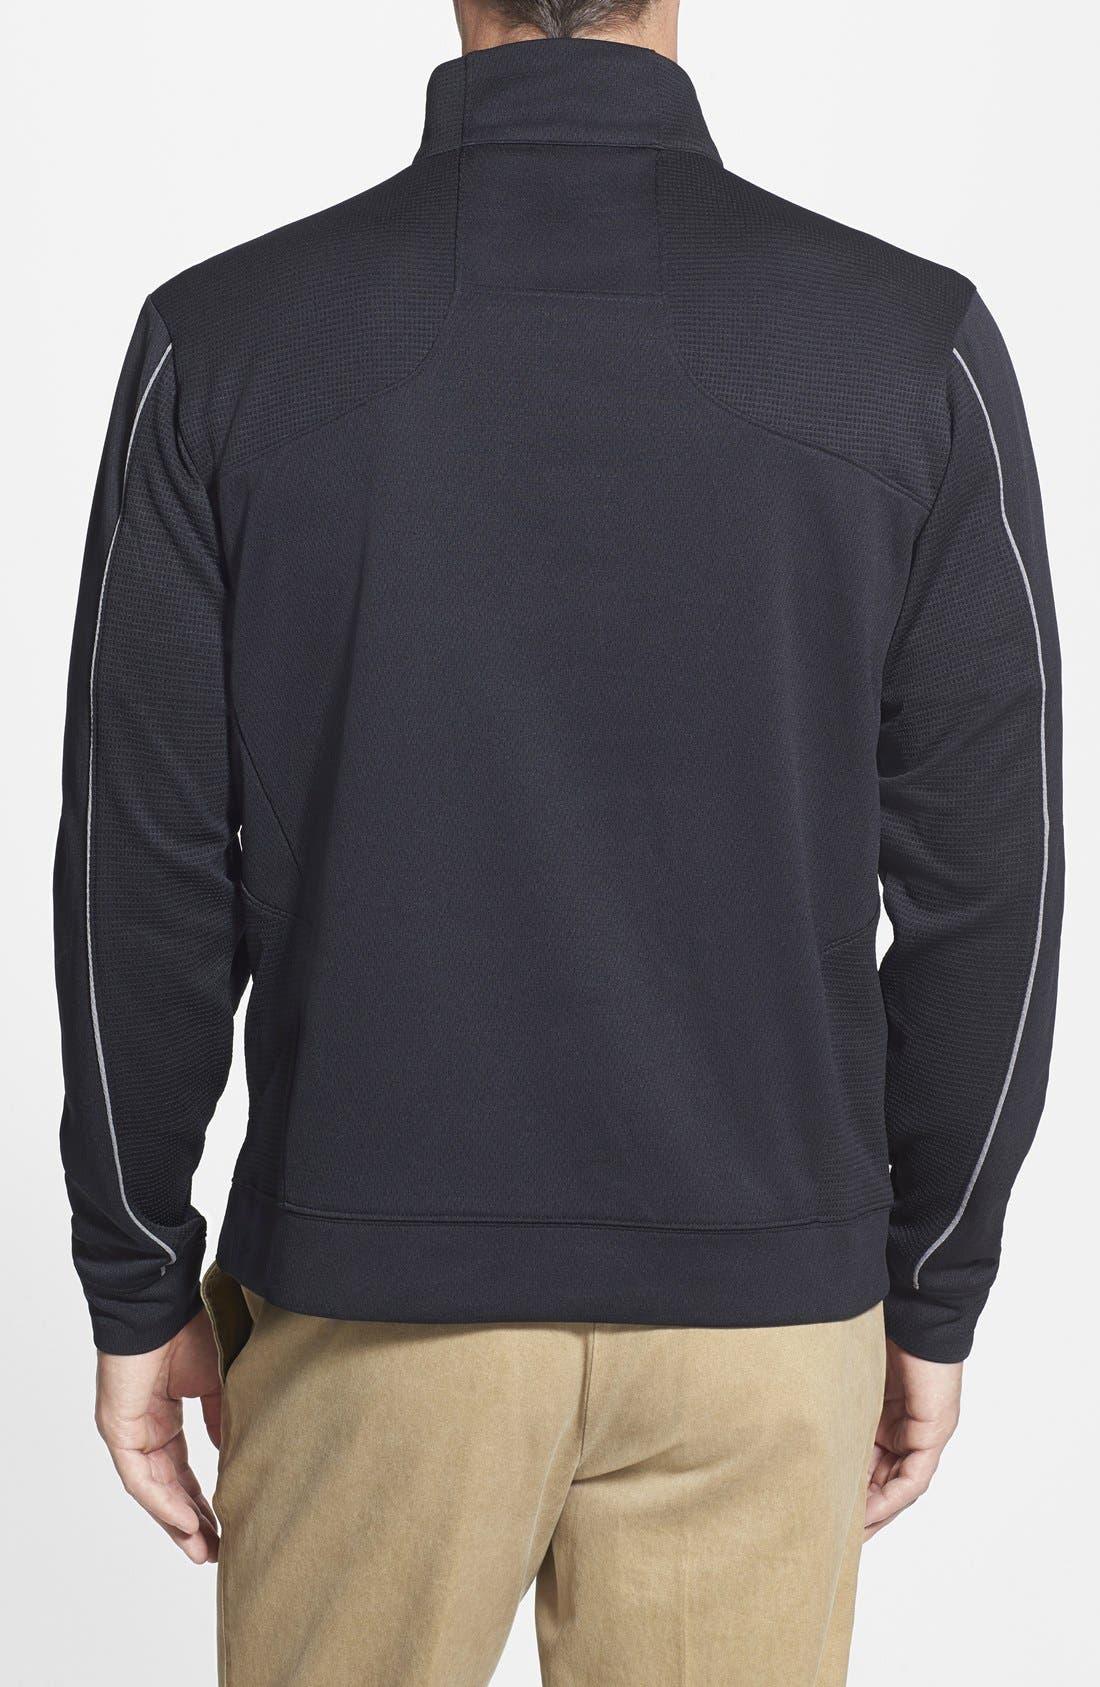 Tampa Bay Buccaneers - Edge DryTec Moisture Wicking Half Zip Pullover,                             Alternate thumbnail 2, color,                             Black